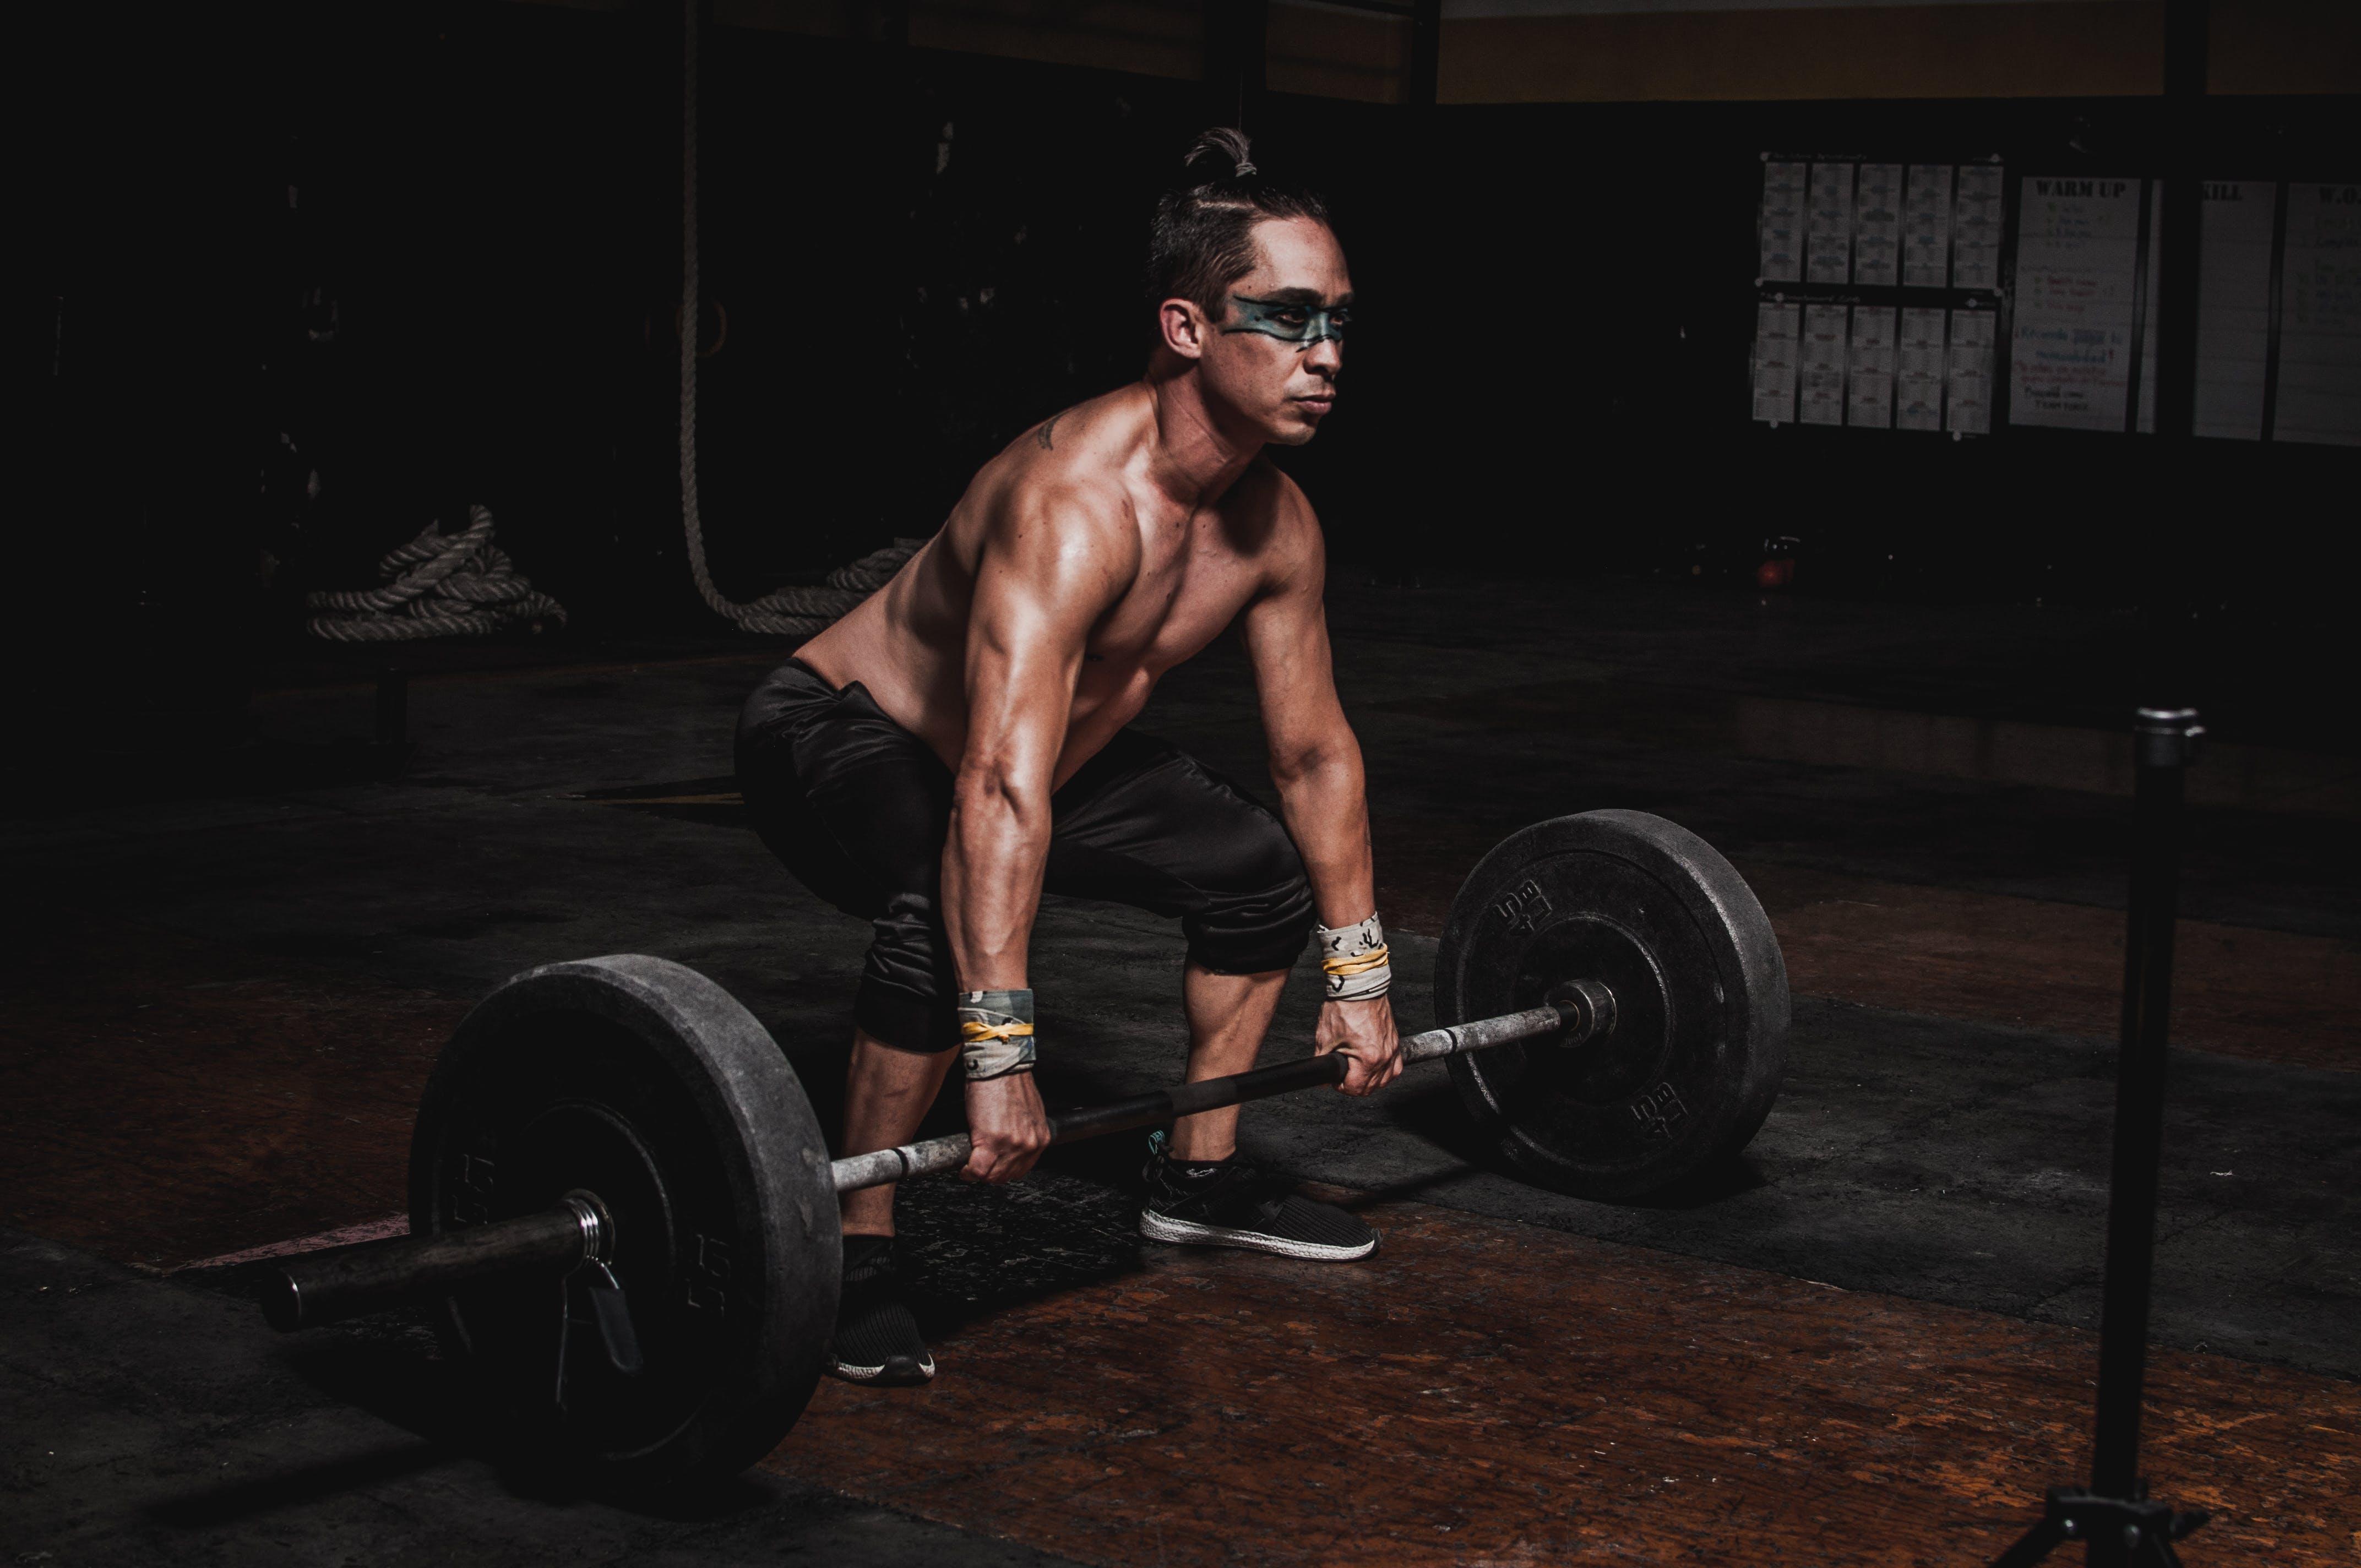 biceps, ciężary, ciężki